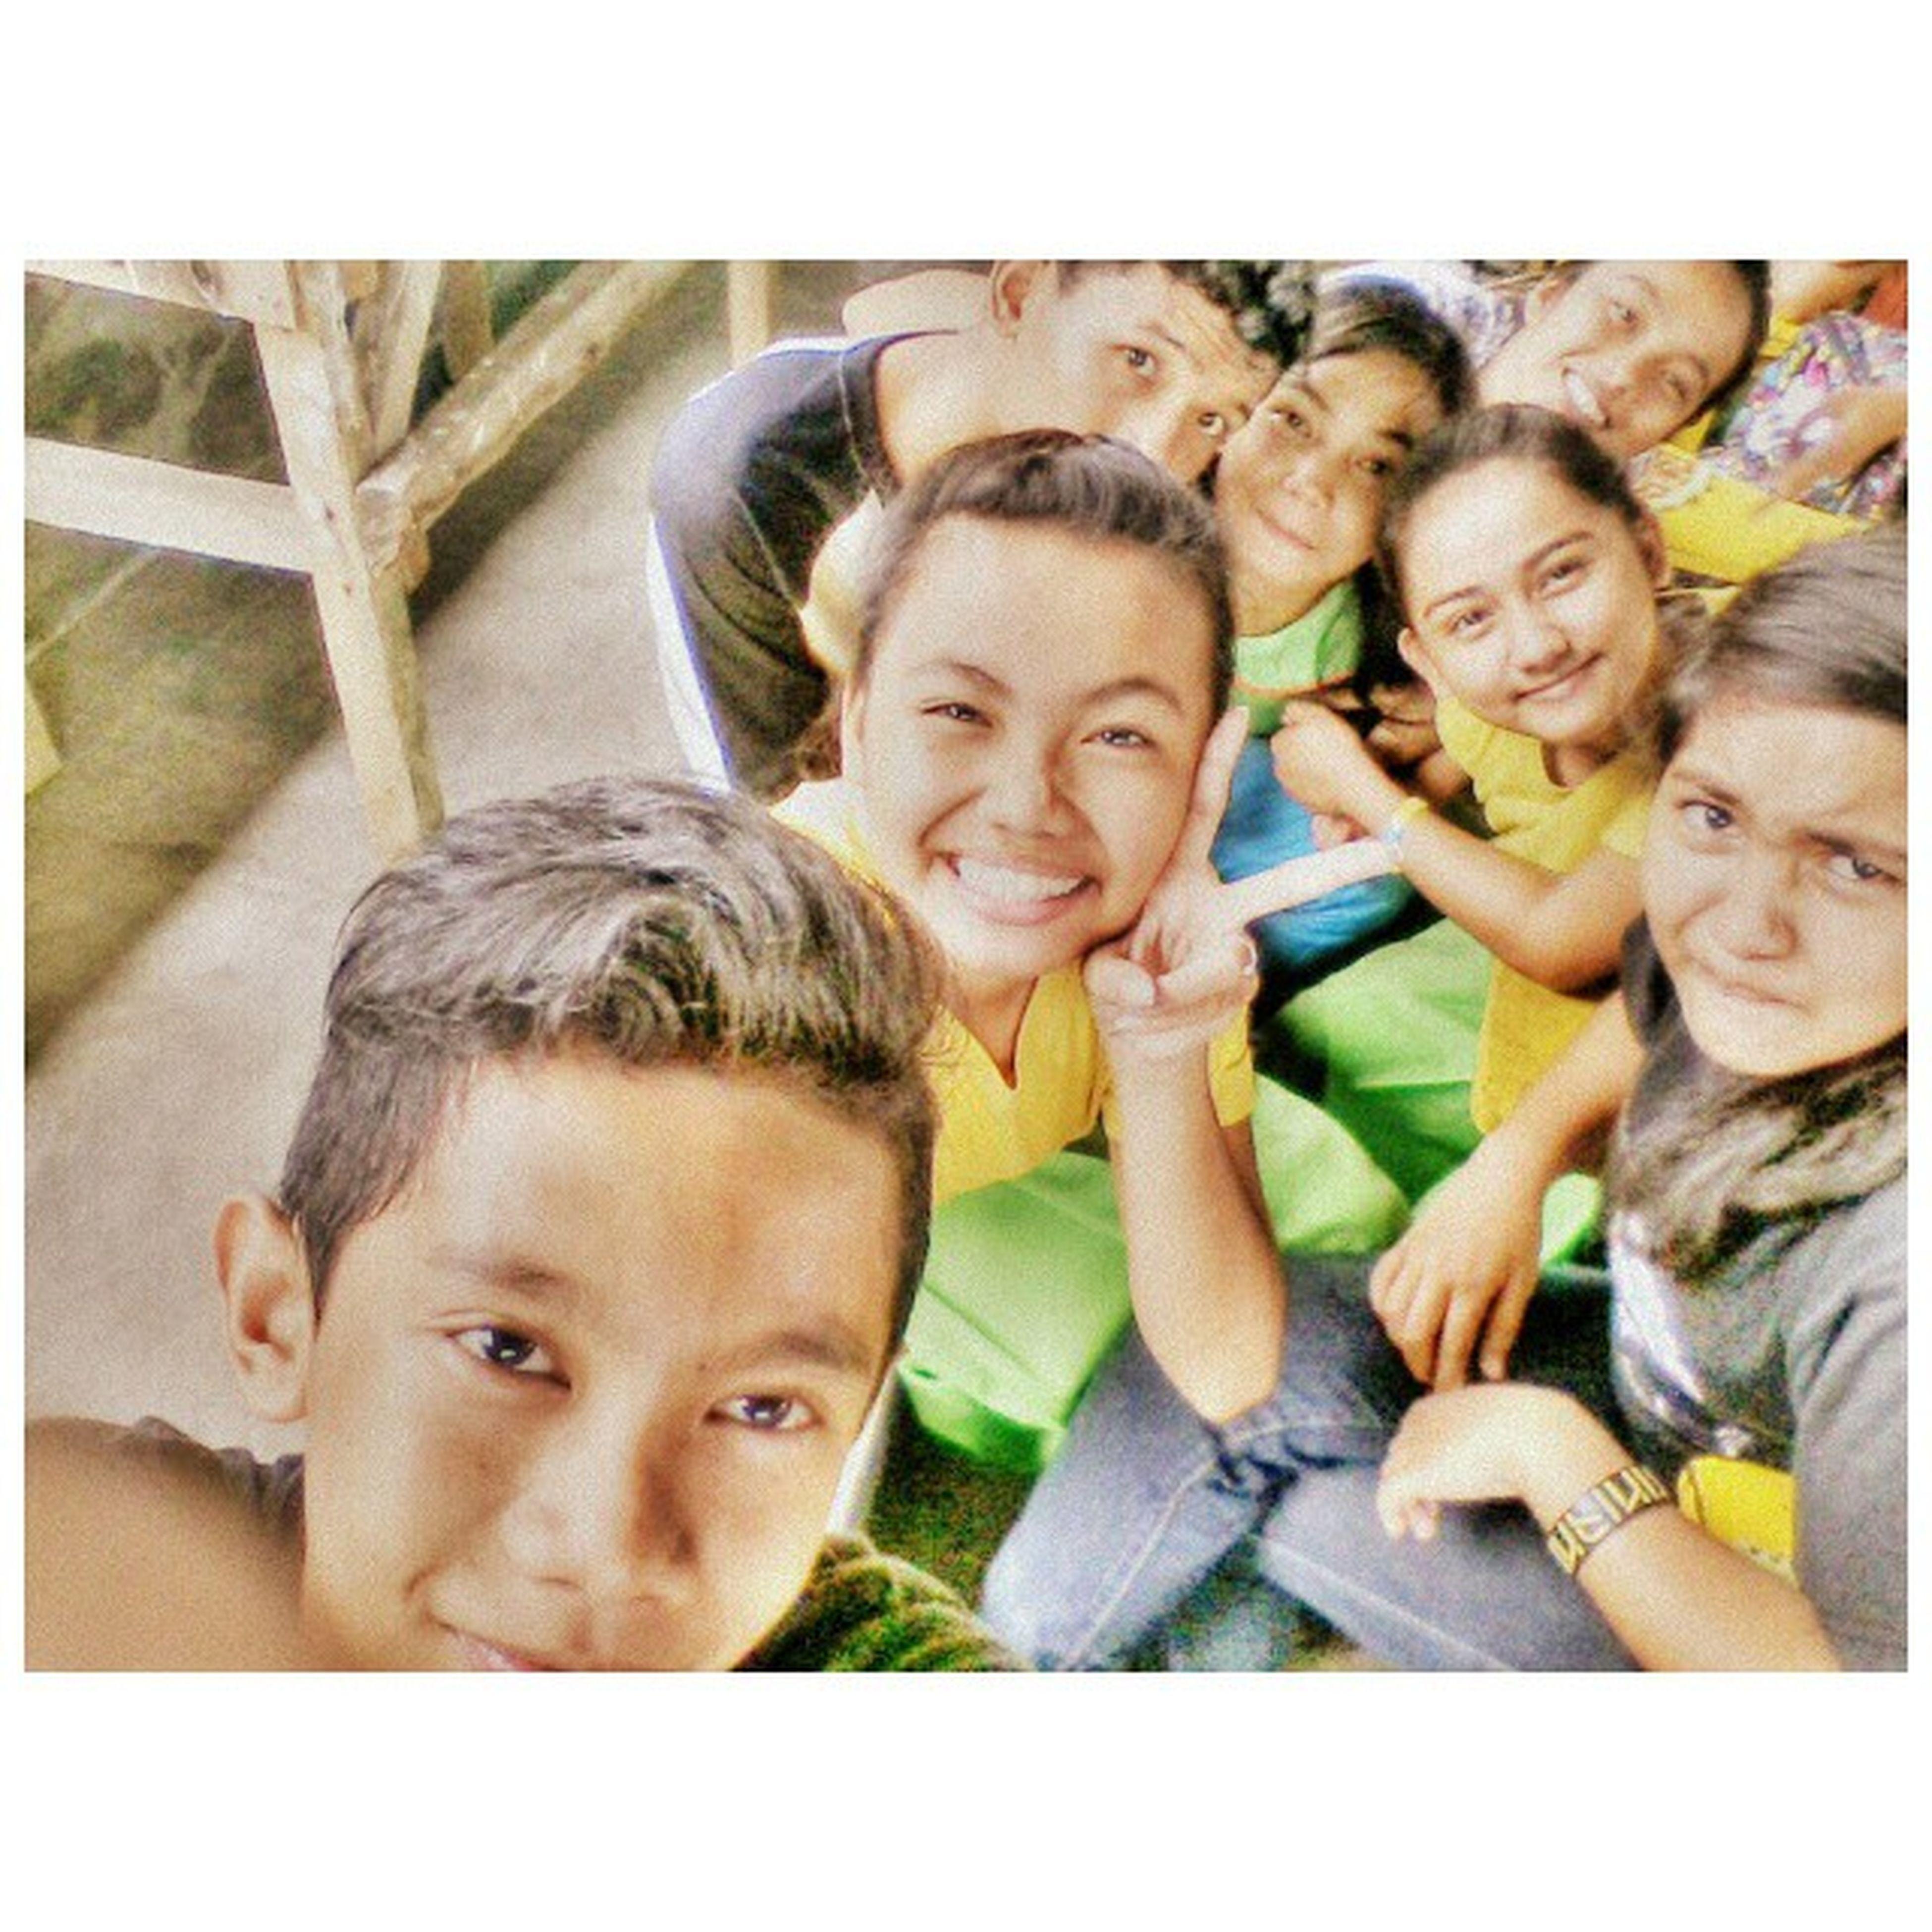 Meet My New Classmates Of 9 - Gemelina 👌 MAPEH Time 😁 NewClassmate BlessDay HappyWeekedGuys ♡♡∞